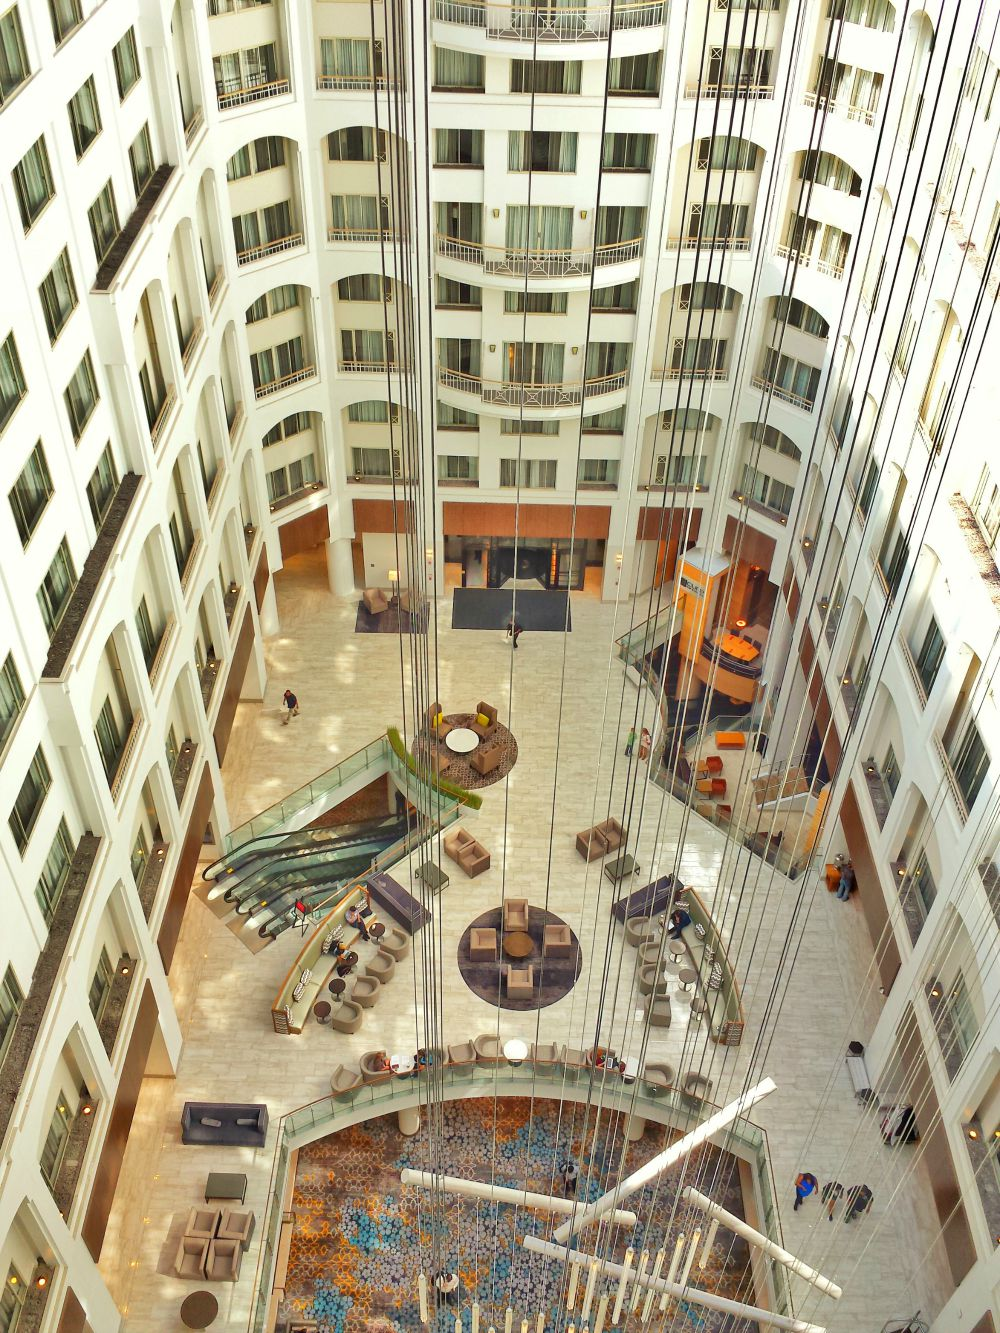 A Traveler S Look At The Grand Hyatt Washington D C Full Service Four Star